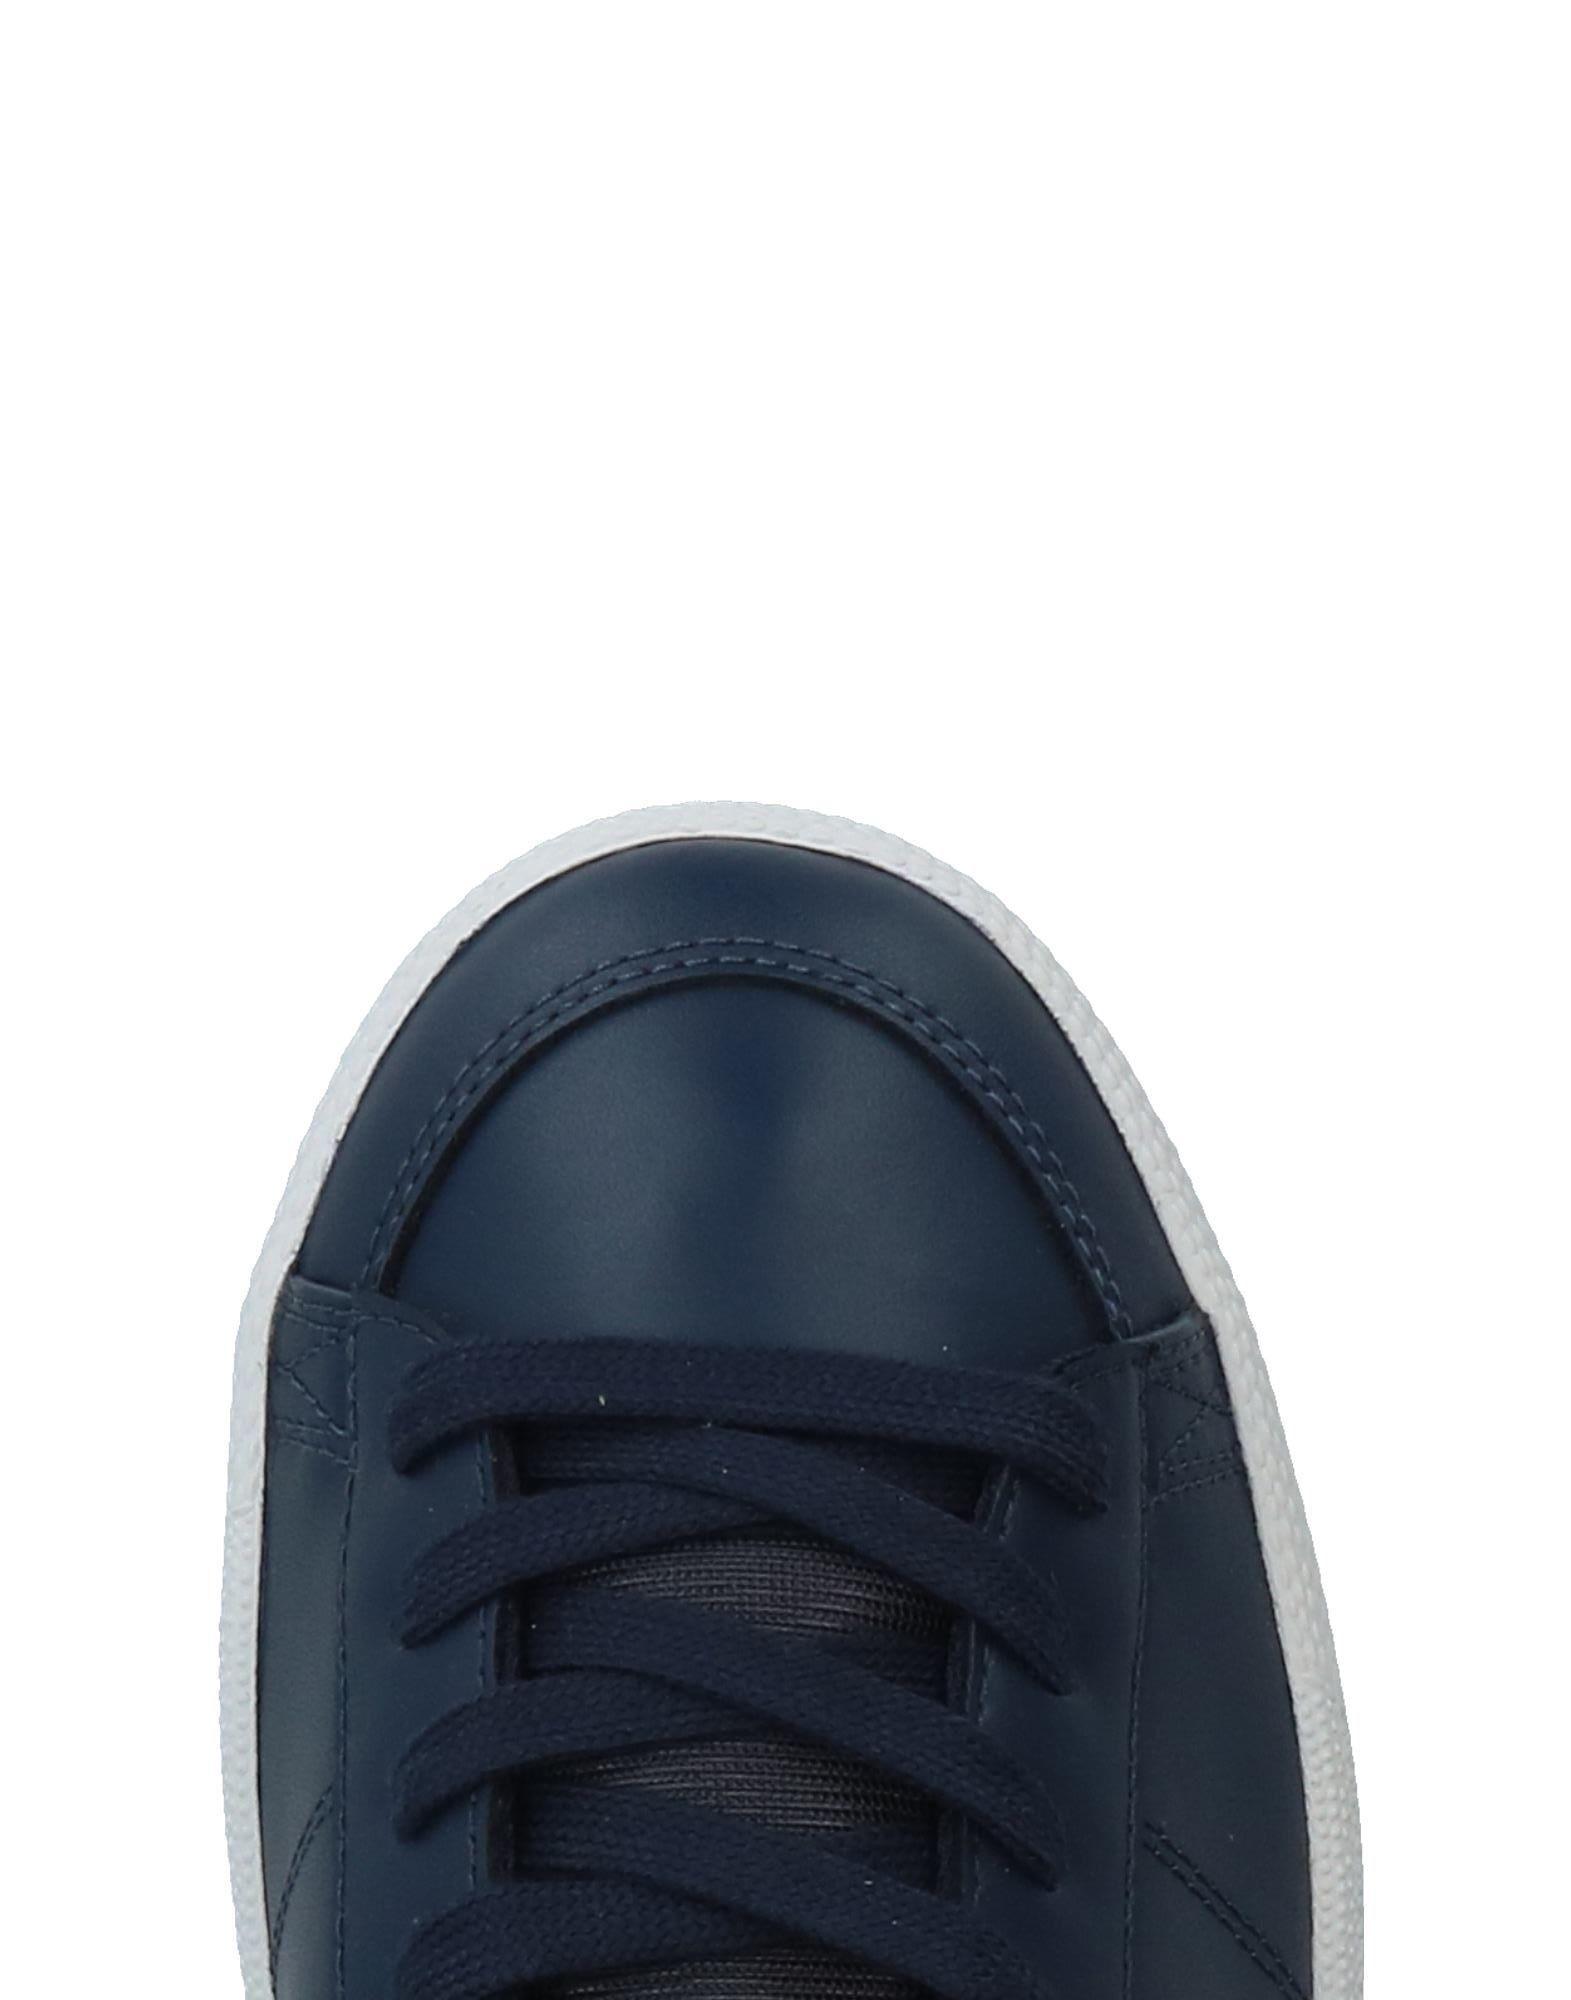 Pony Sneakers Sneakers Pony Herren  11342594VC Heiße Schuhe 0a05bb